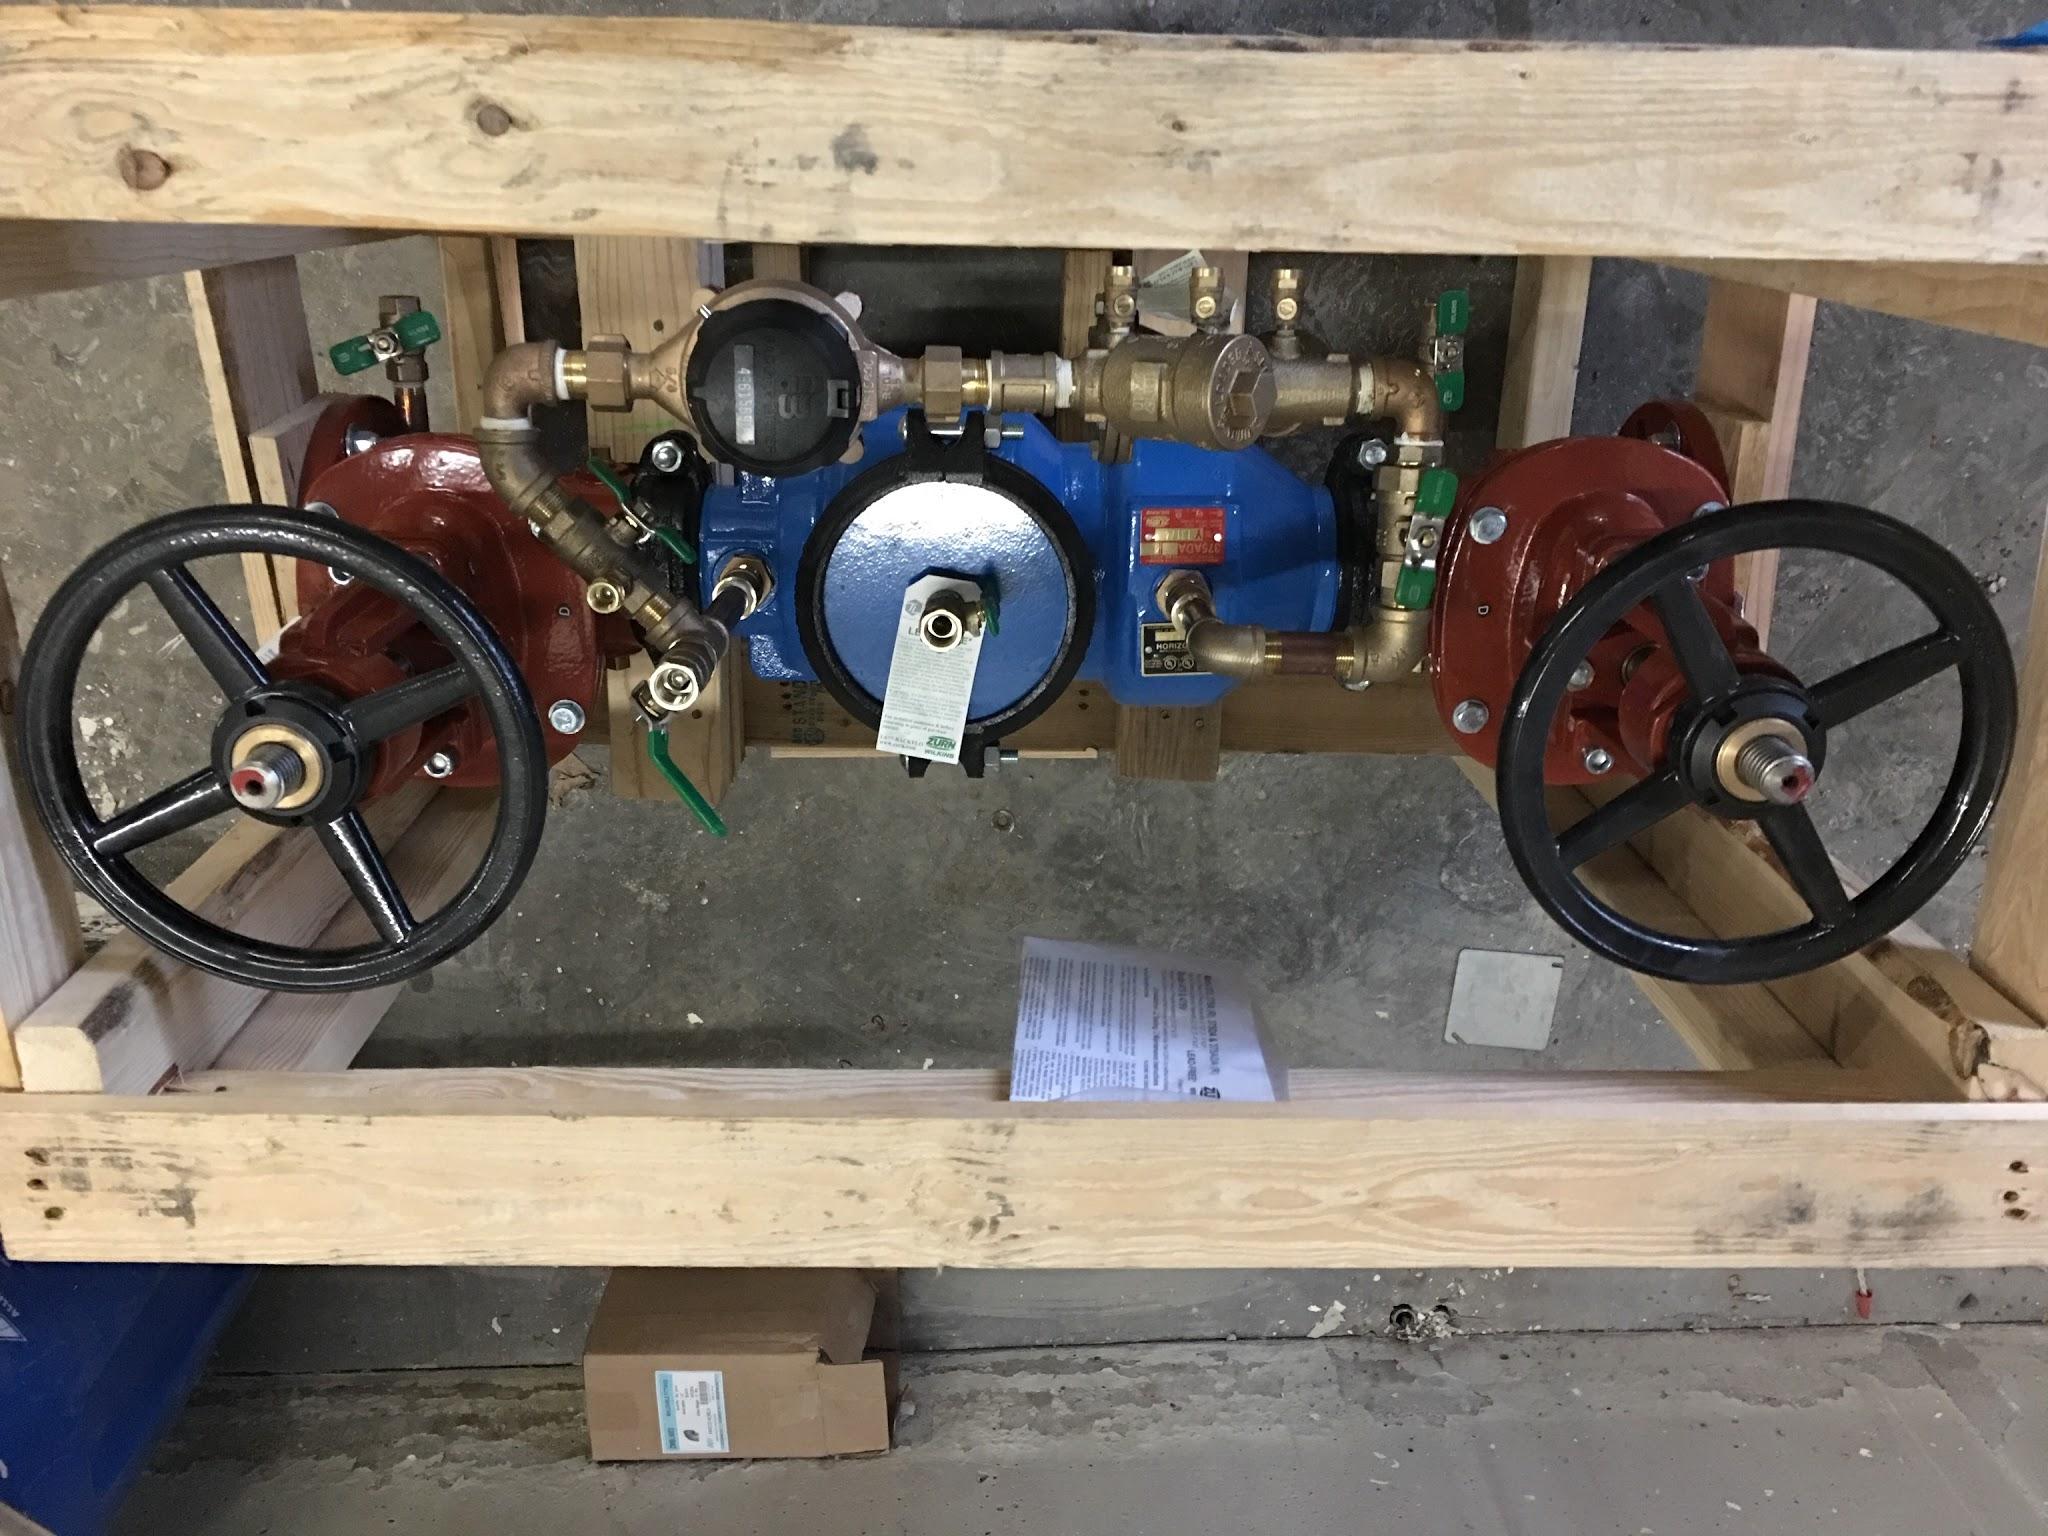 Fire Suppression Pump (Safety First)